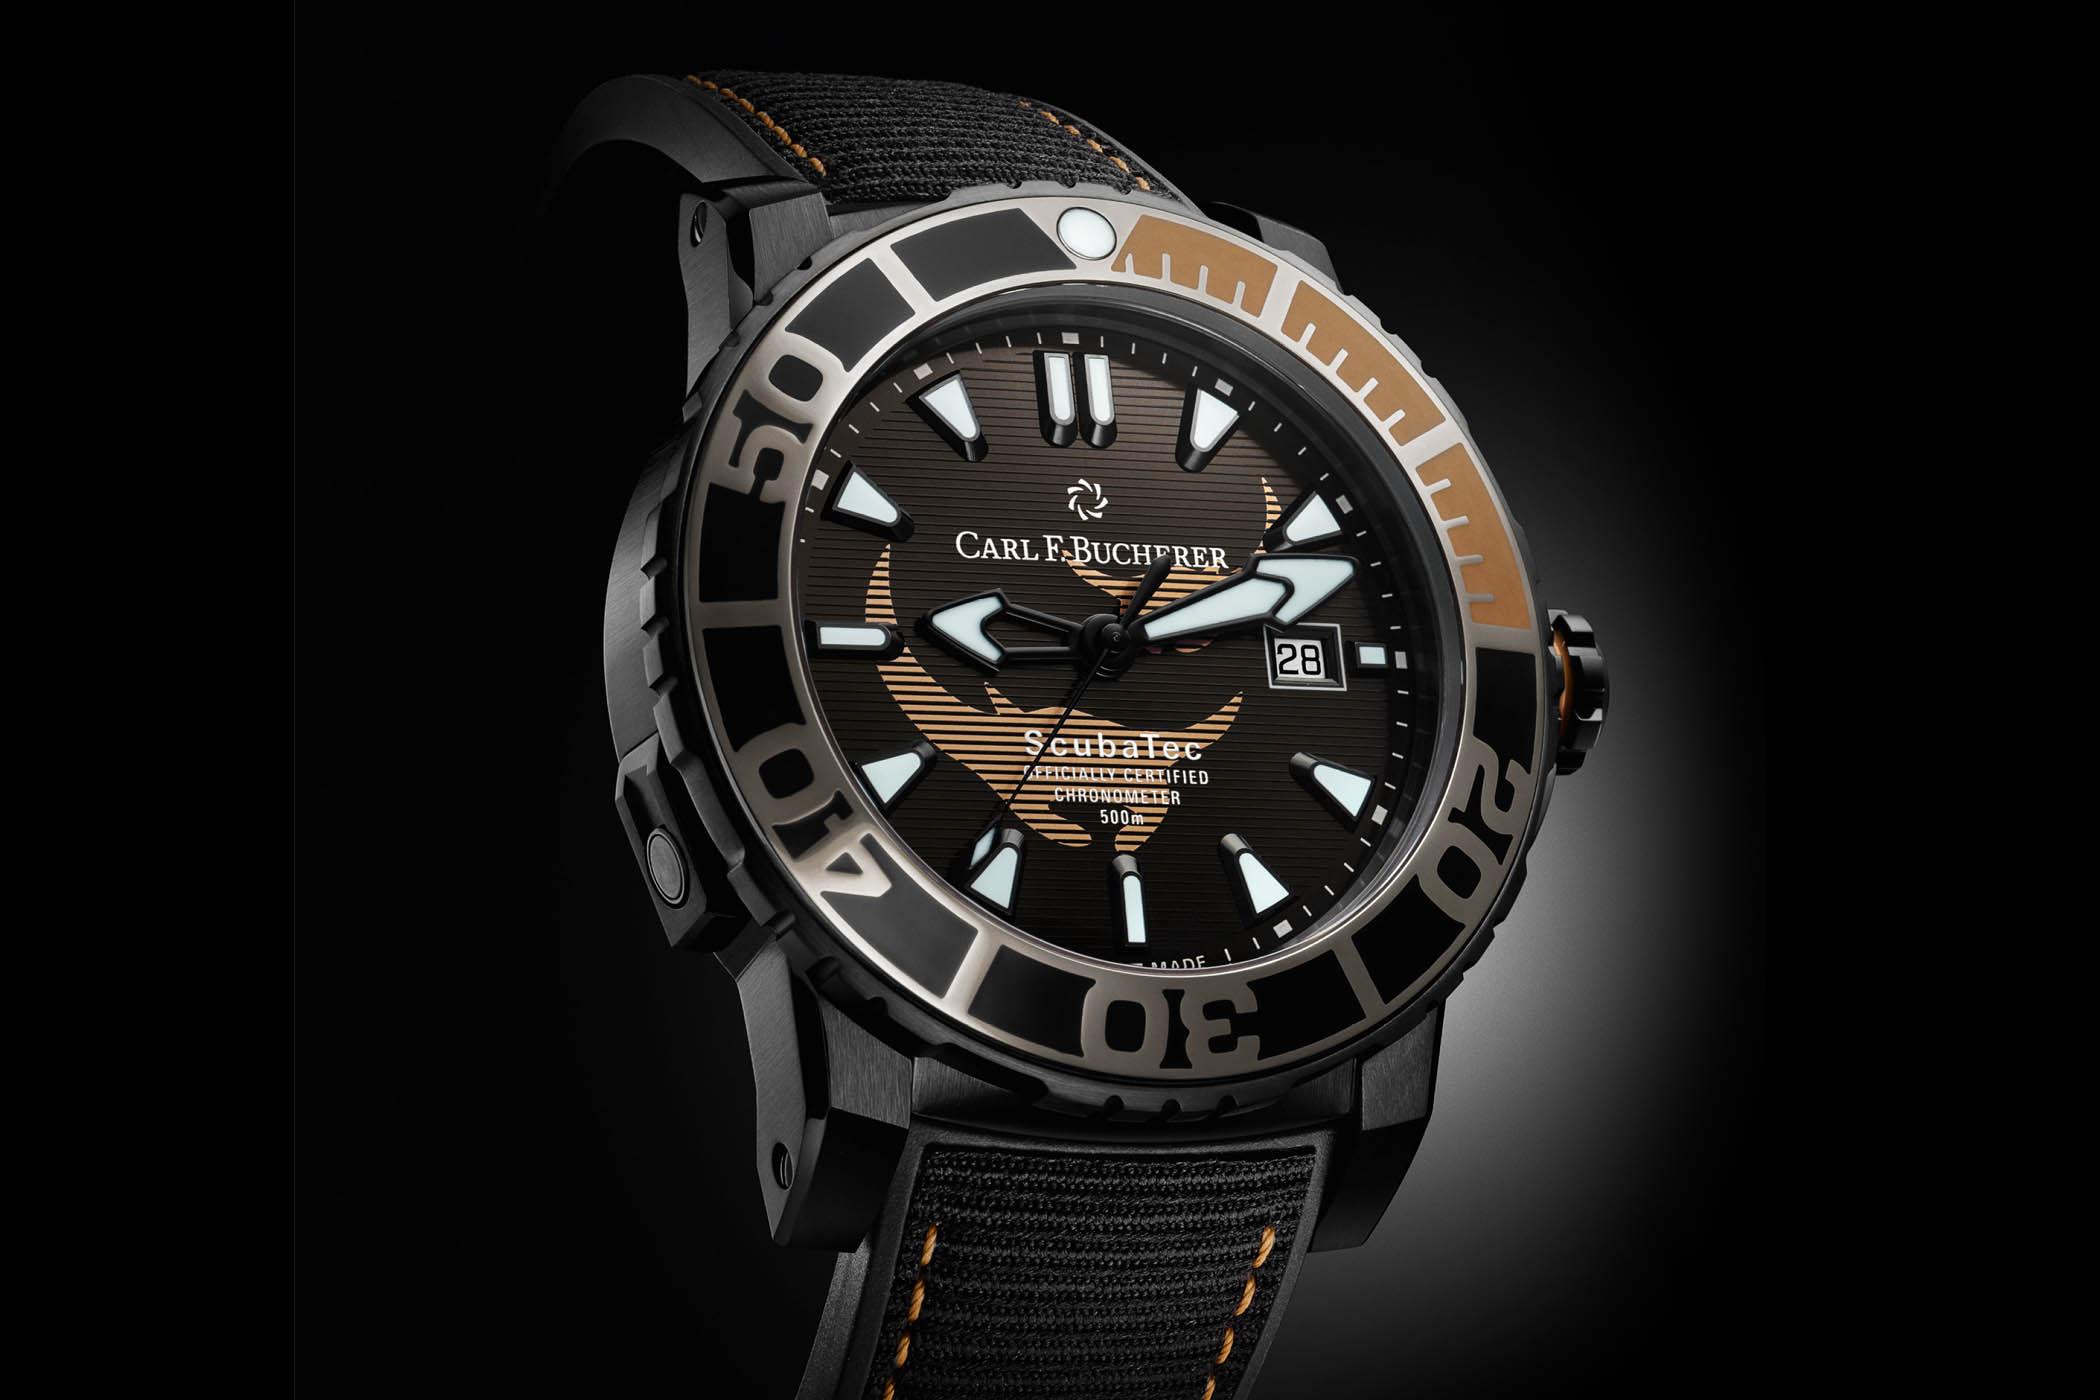 Carl F. Bucherer Patravi ScubaTec Black Manta Special Edition - Monochrome  Watches